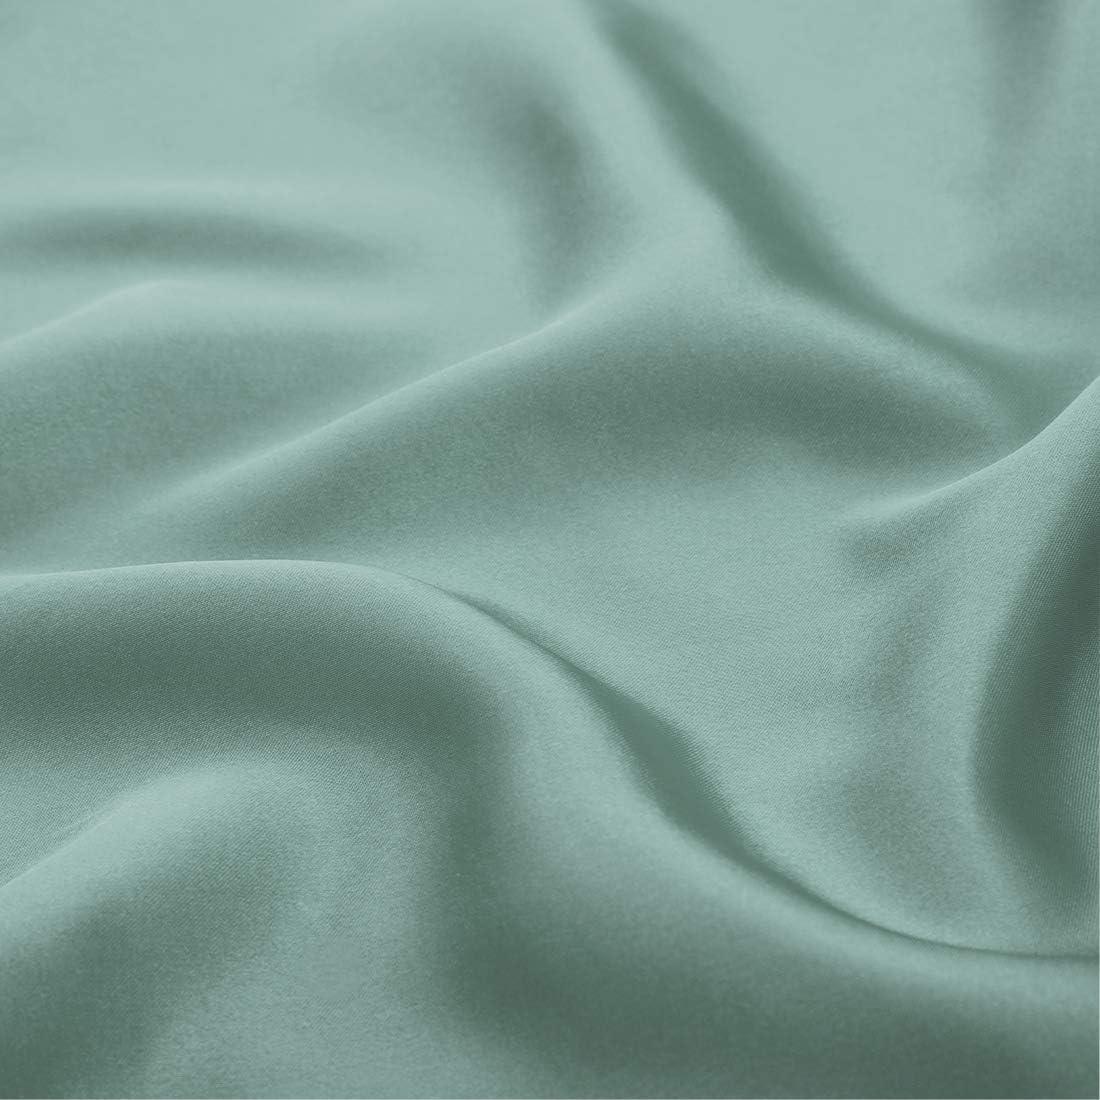 1 Pillowcase 1 Flat Sheet Cobedzy 3 Pcs Black Satin Sheets Twin Size Soft Silk Satin Bedding Sheets Set with 1 Deep Pocket Fitted Sheet